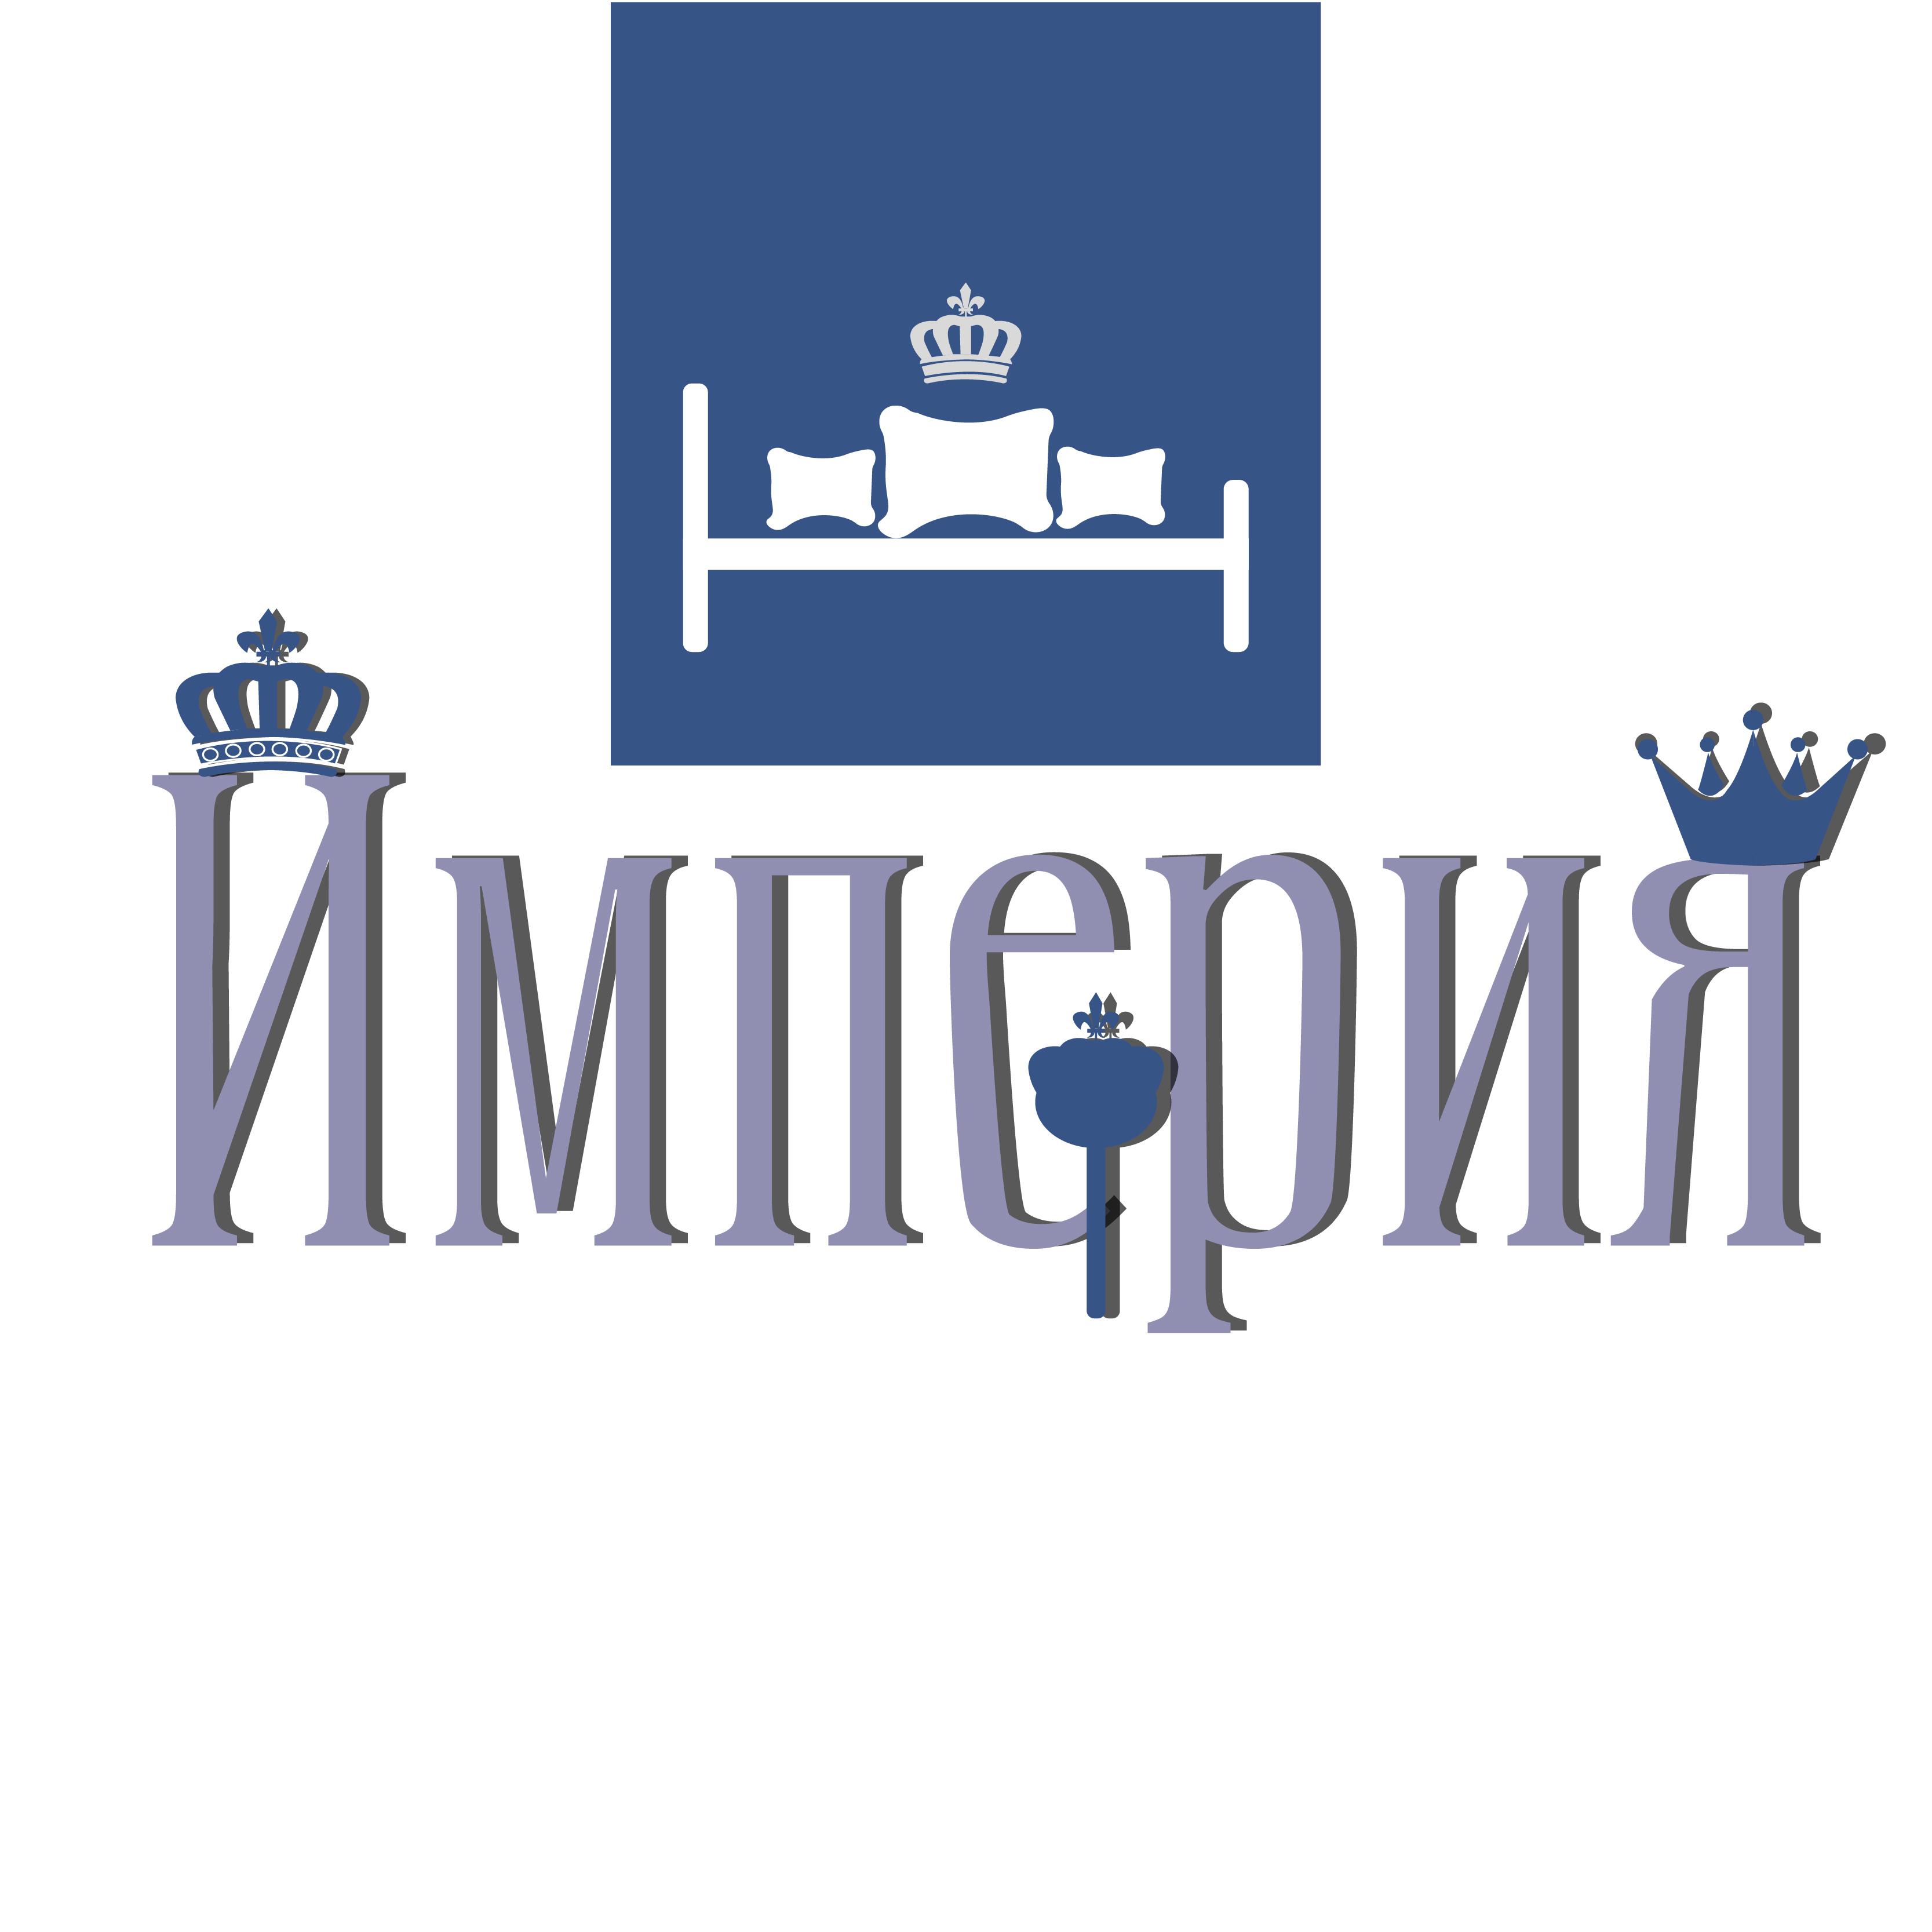 Разработать логотип для нового бренда фото f_73159e7a317b4215.jpg